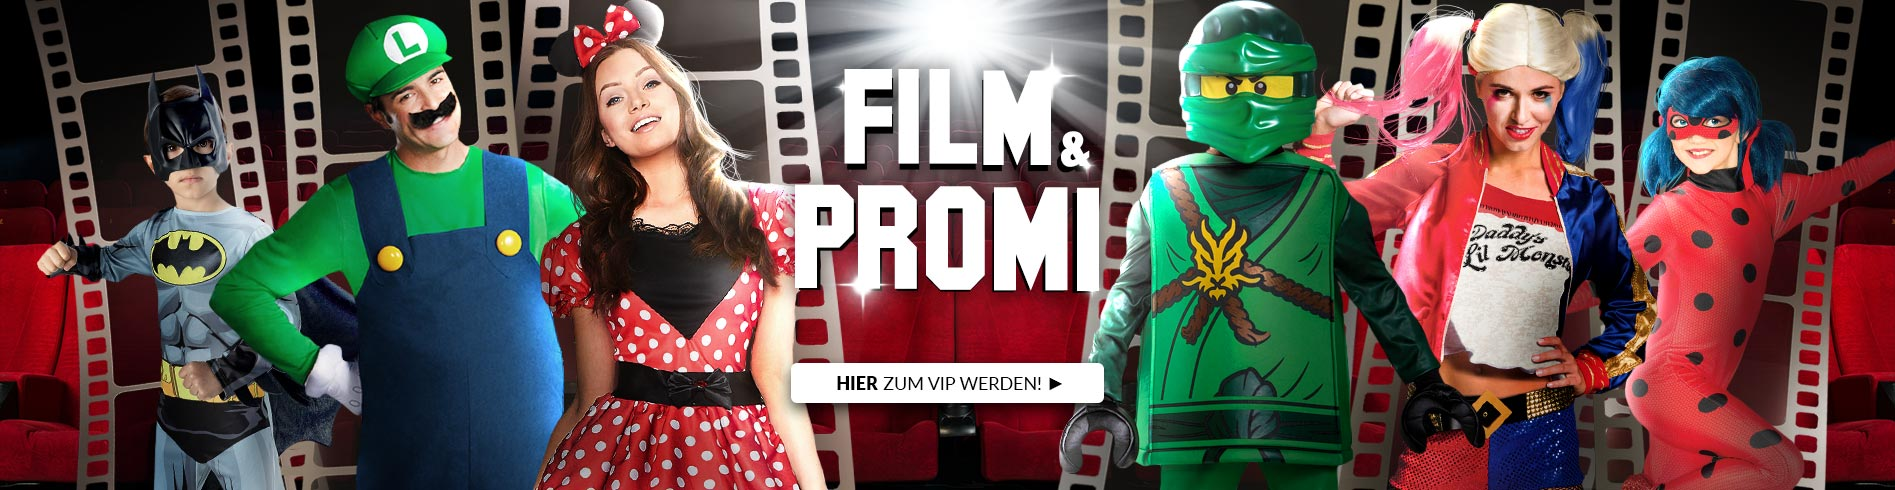 Film & Stars